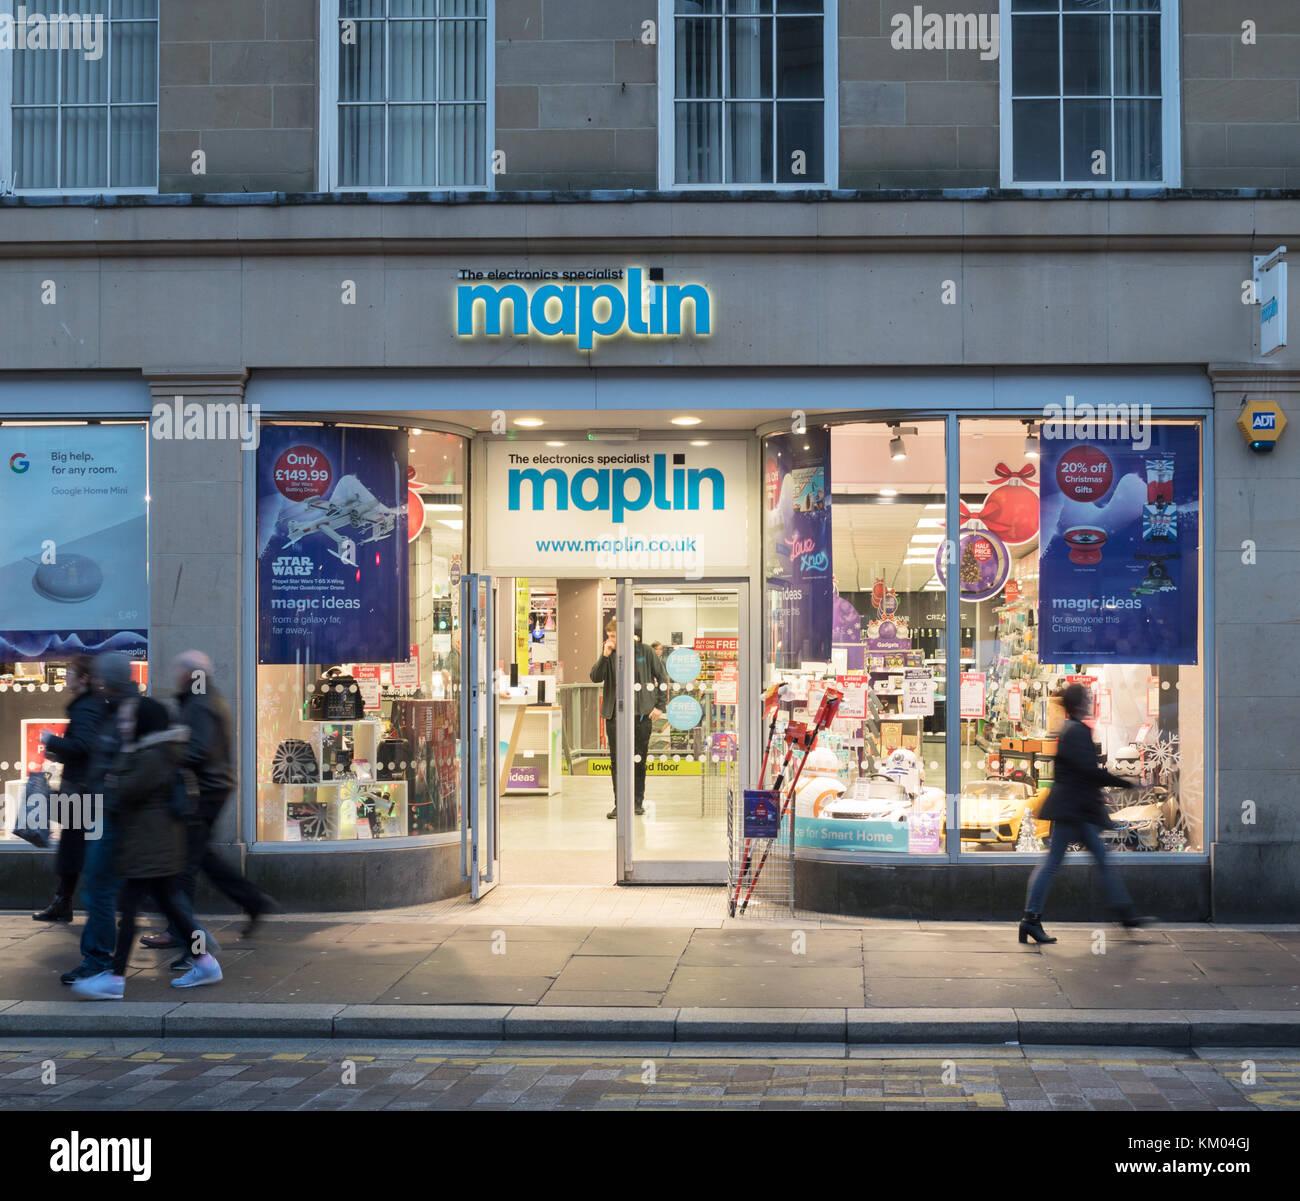 Maplin store front, Newcastle upon Tyne, England, UK - Stock Image